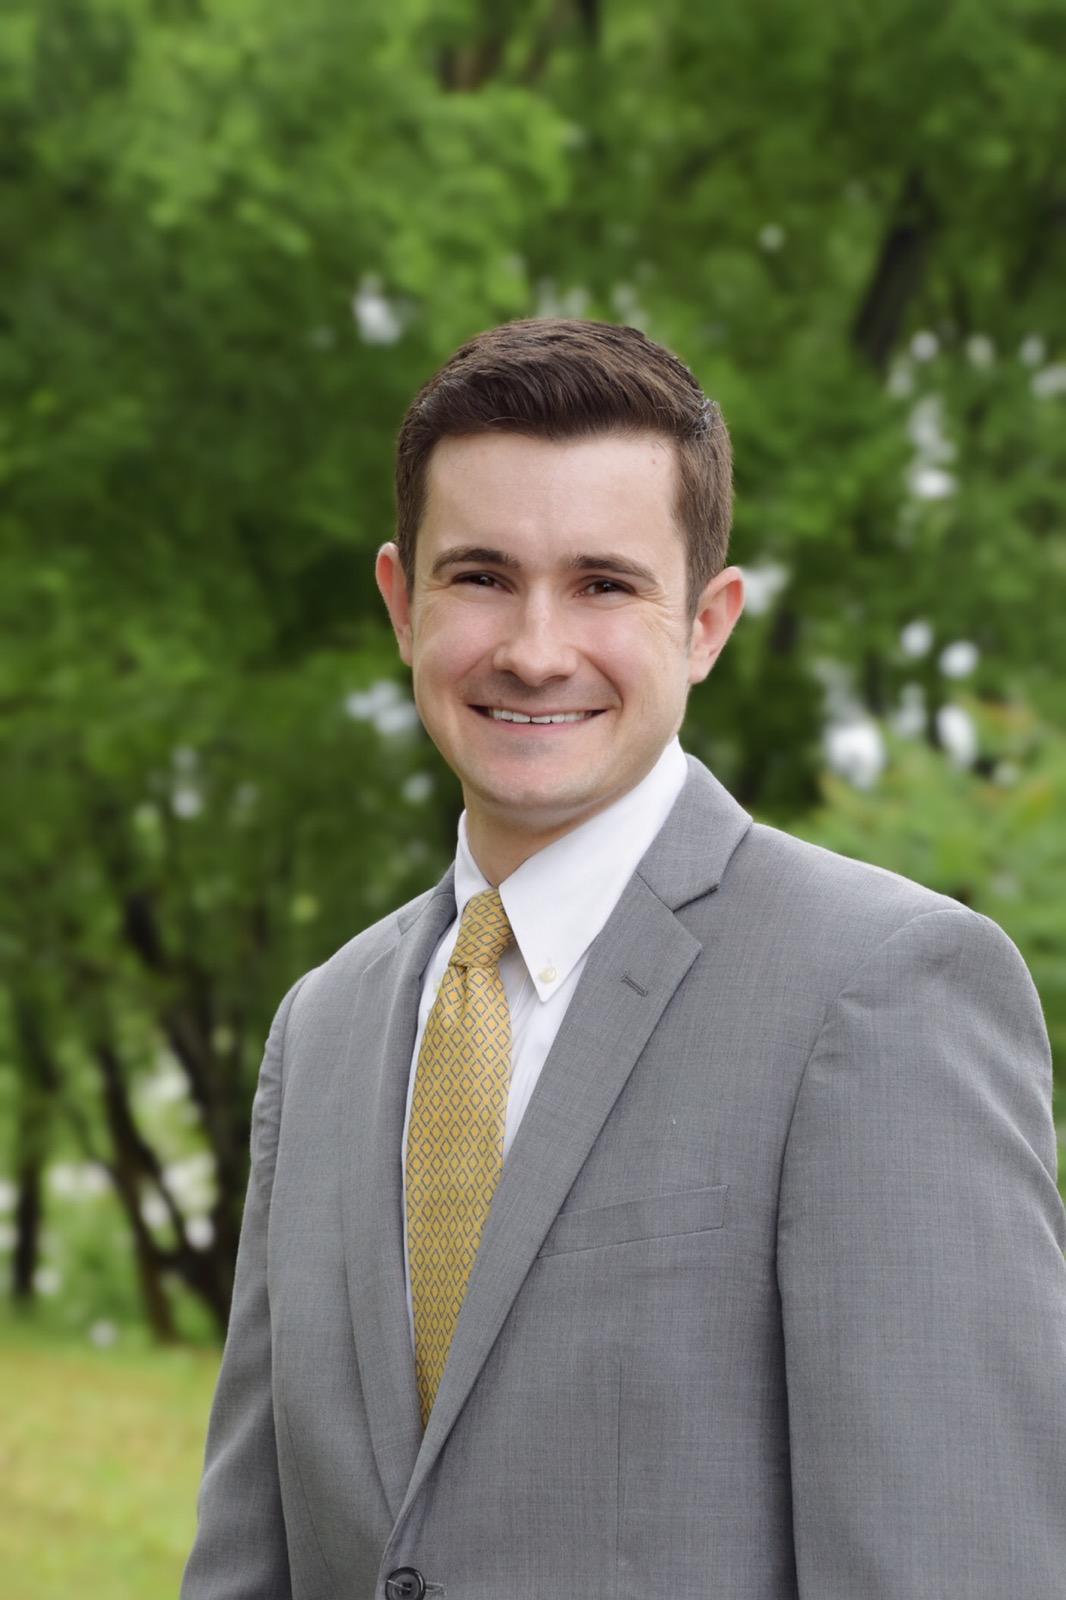 David Gershner - Attorney at Law